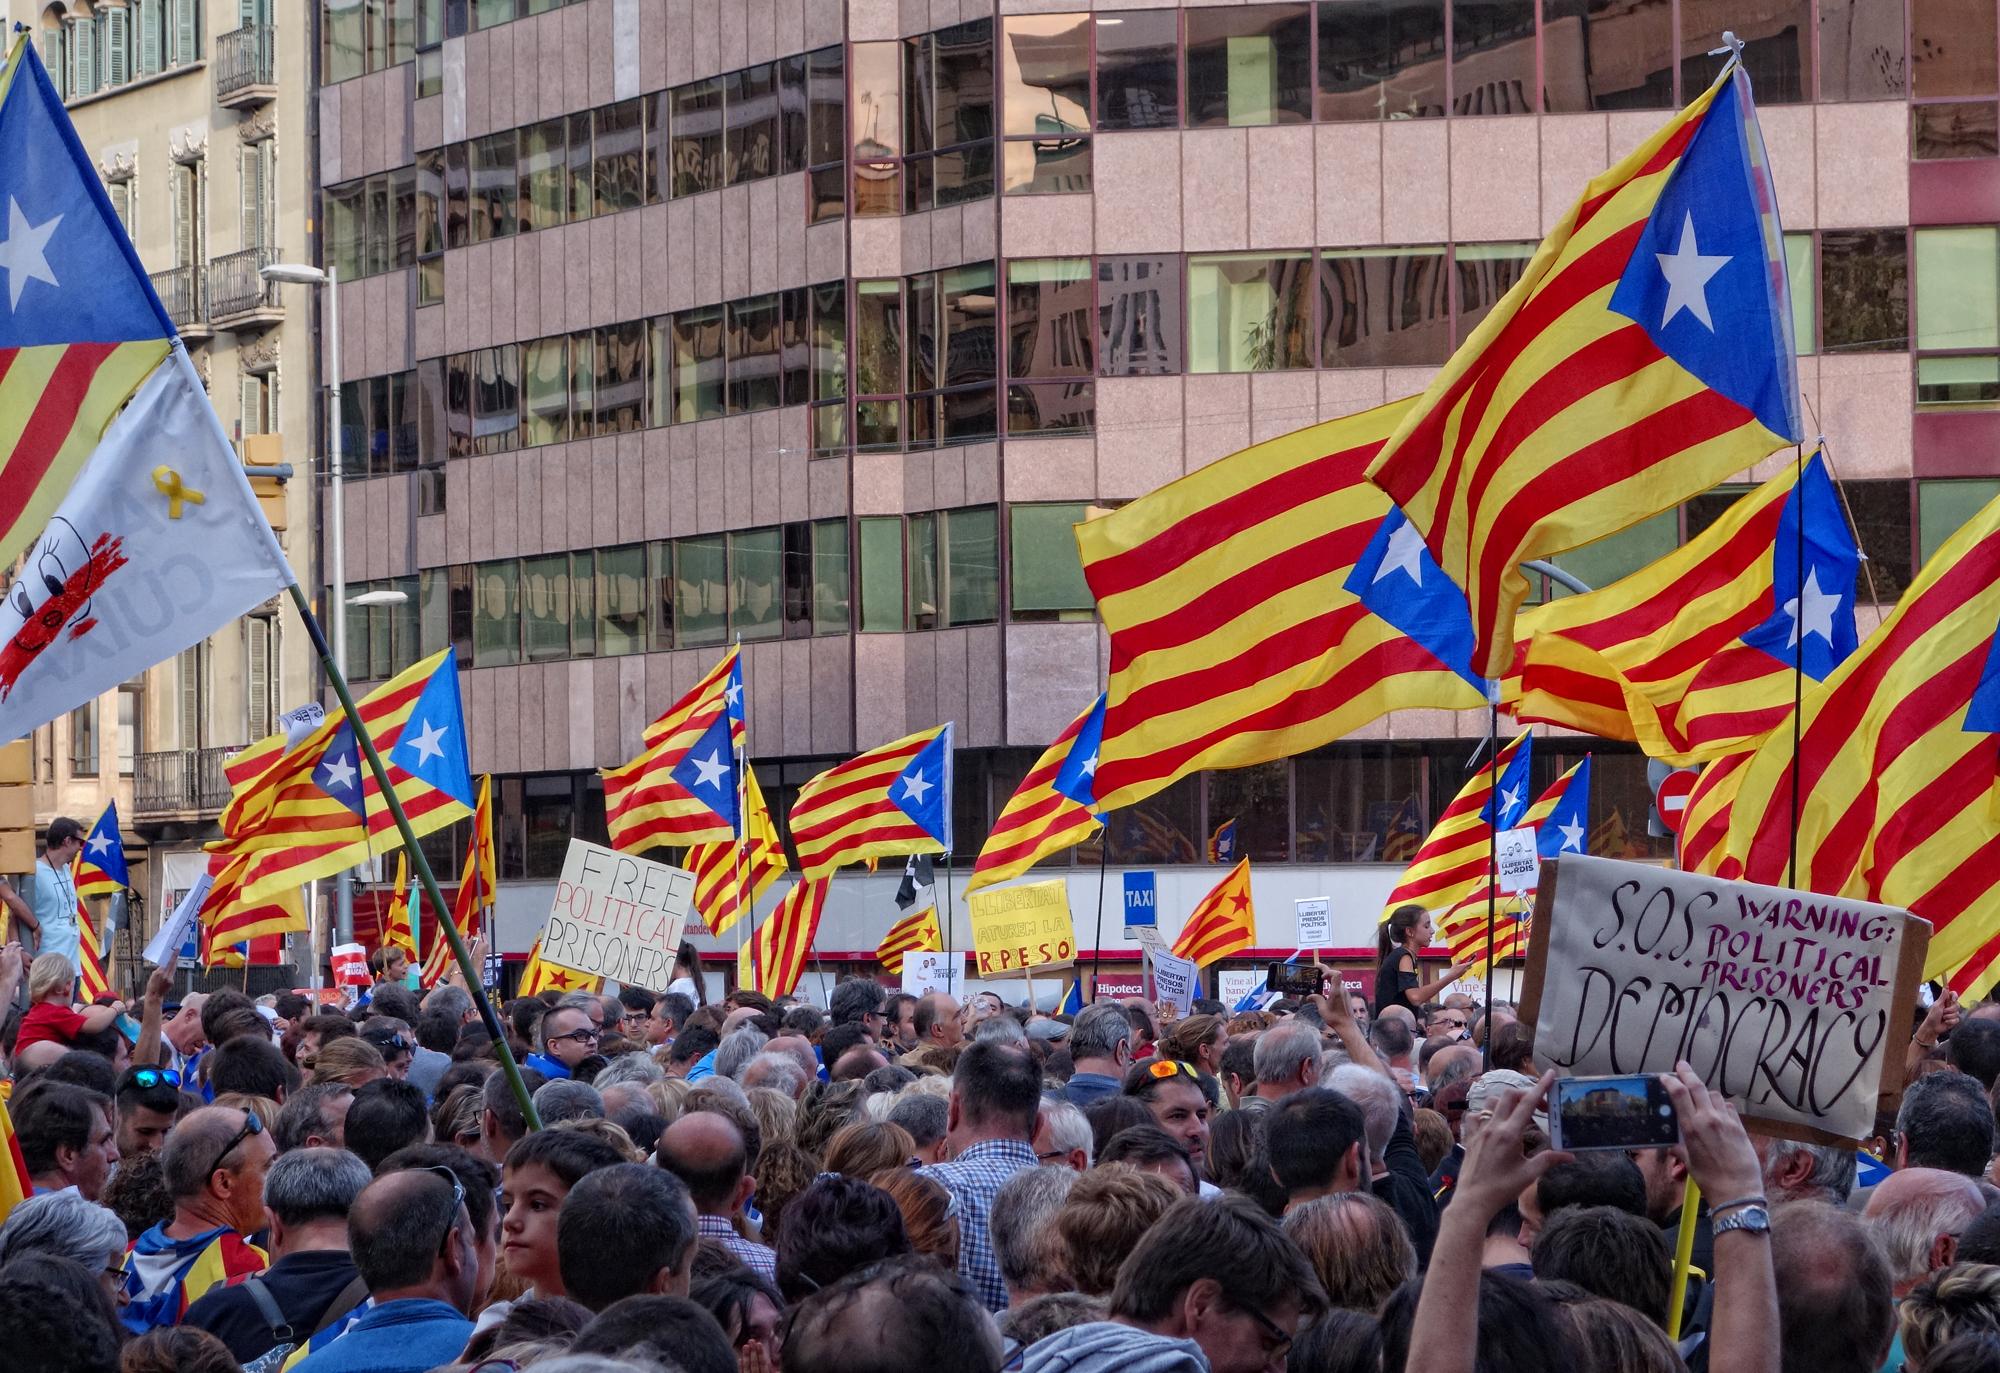 Manifestacion, #1, Barcelona, Catalunya, Espanya, 2017